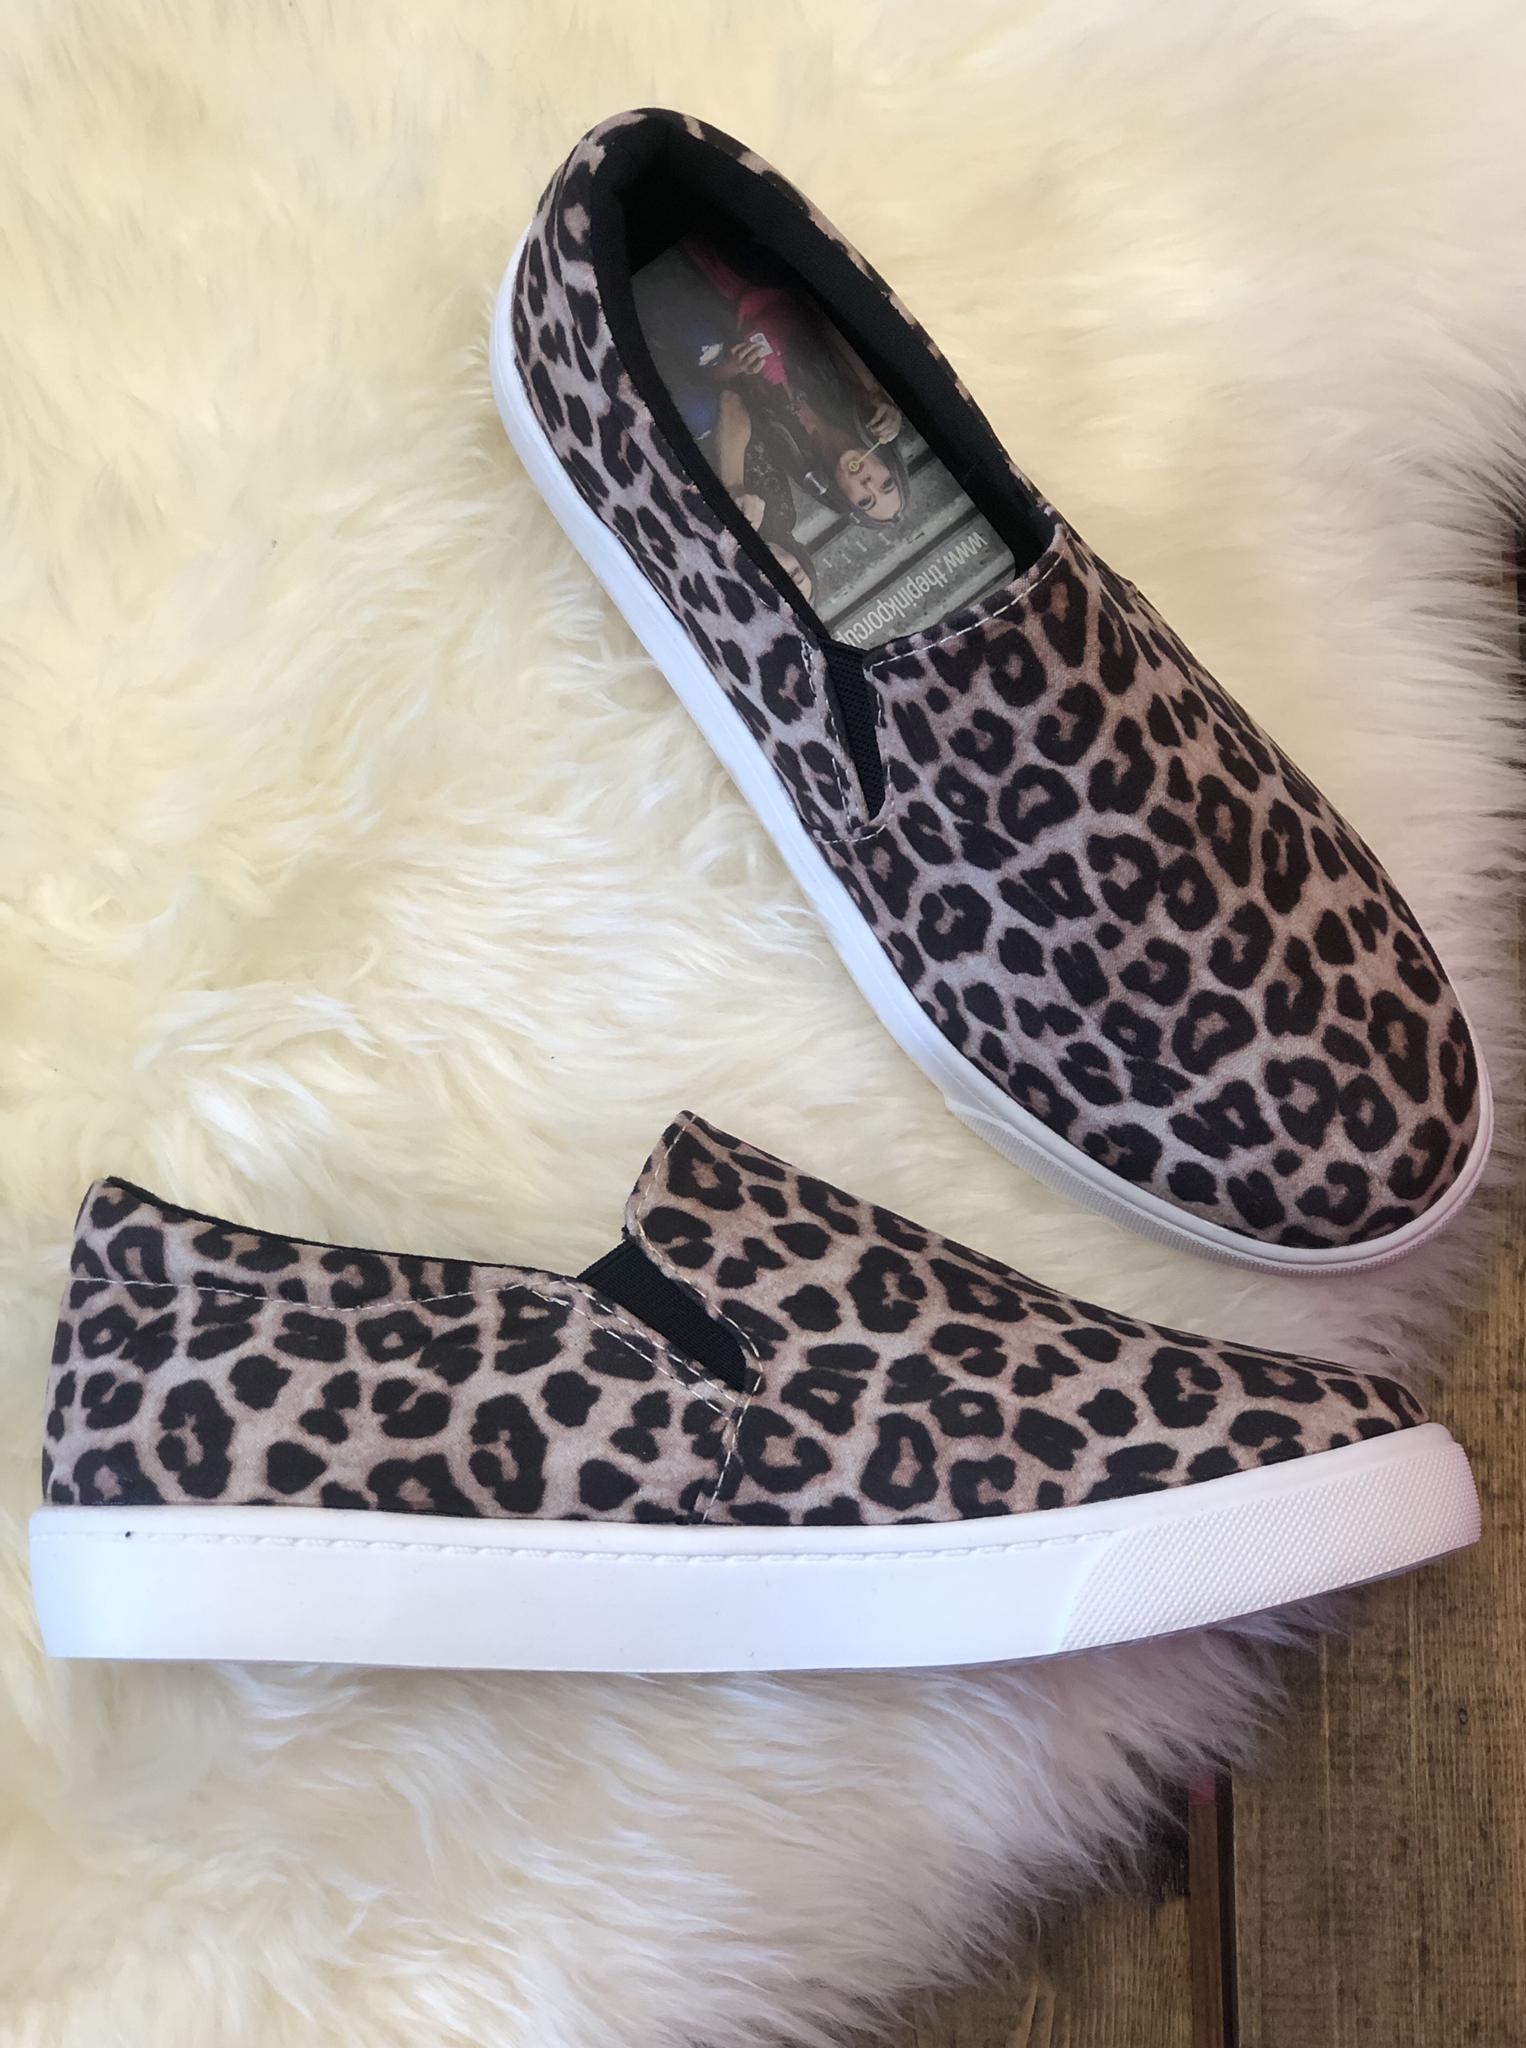 The Cheetah Flats 2.0 982537